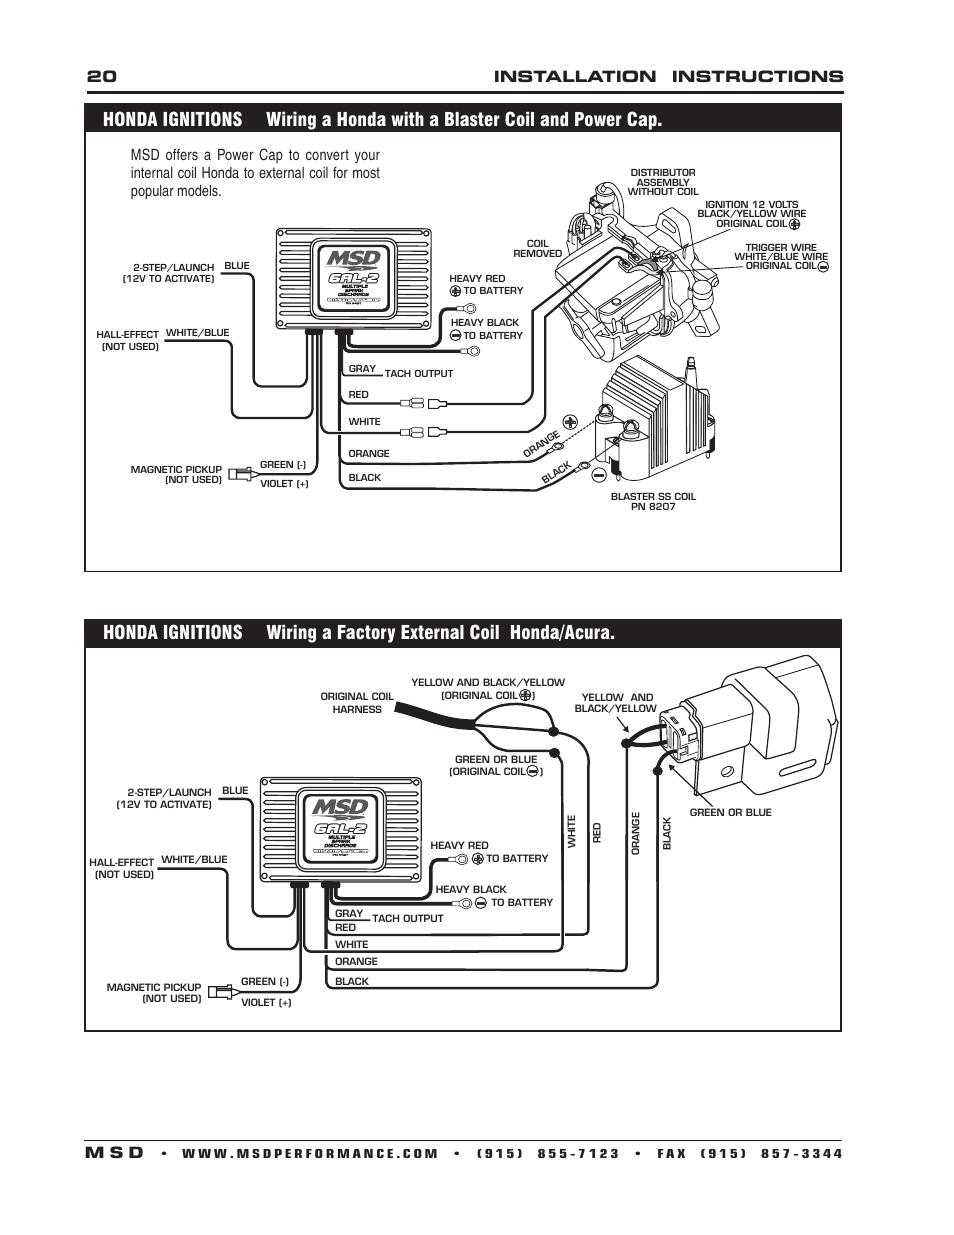 6421 Msd 6al 2 Wiring Diagram Electrical Diagrams Ignition Schematics Gm Distributor